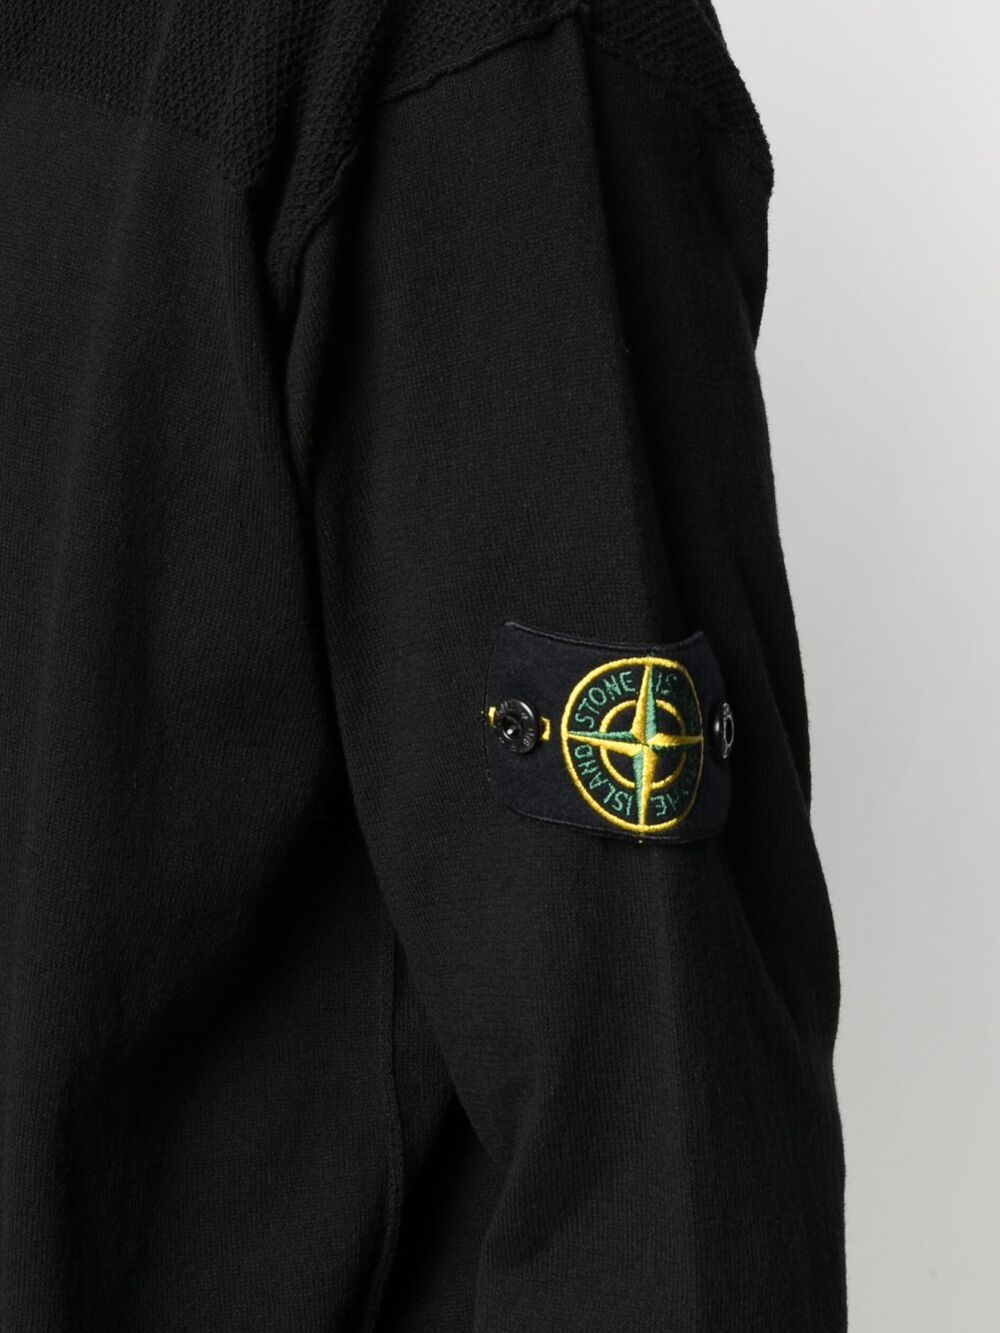 Black cotton cardigan featuring Stone Island logo patch at the sleeve STONE ISLAND |  | 7415531B4V0029